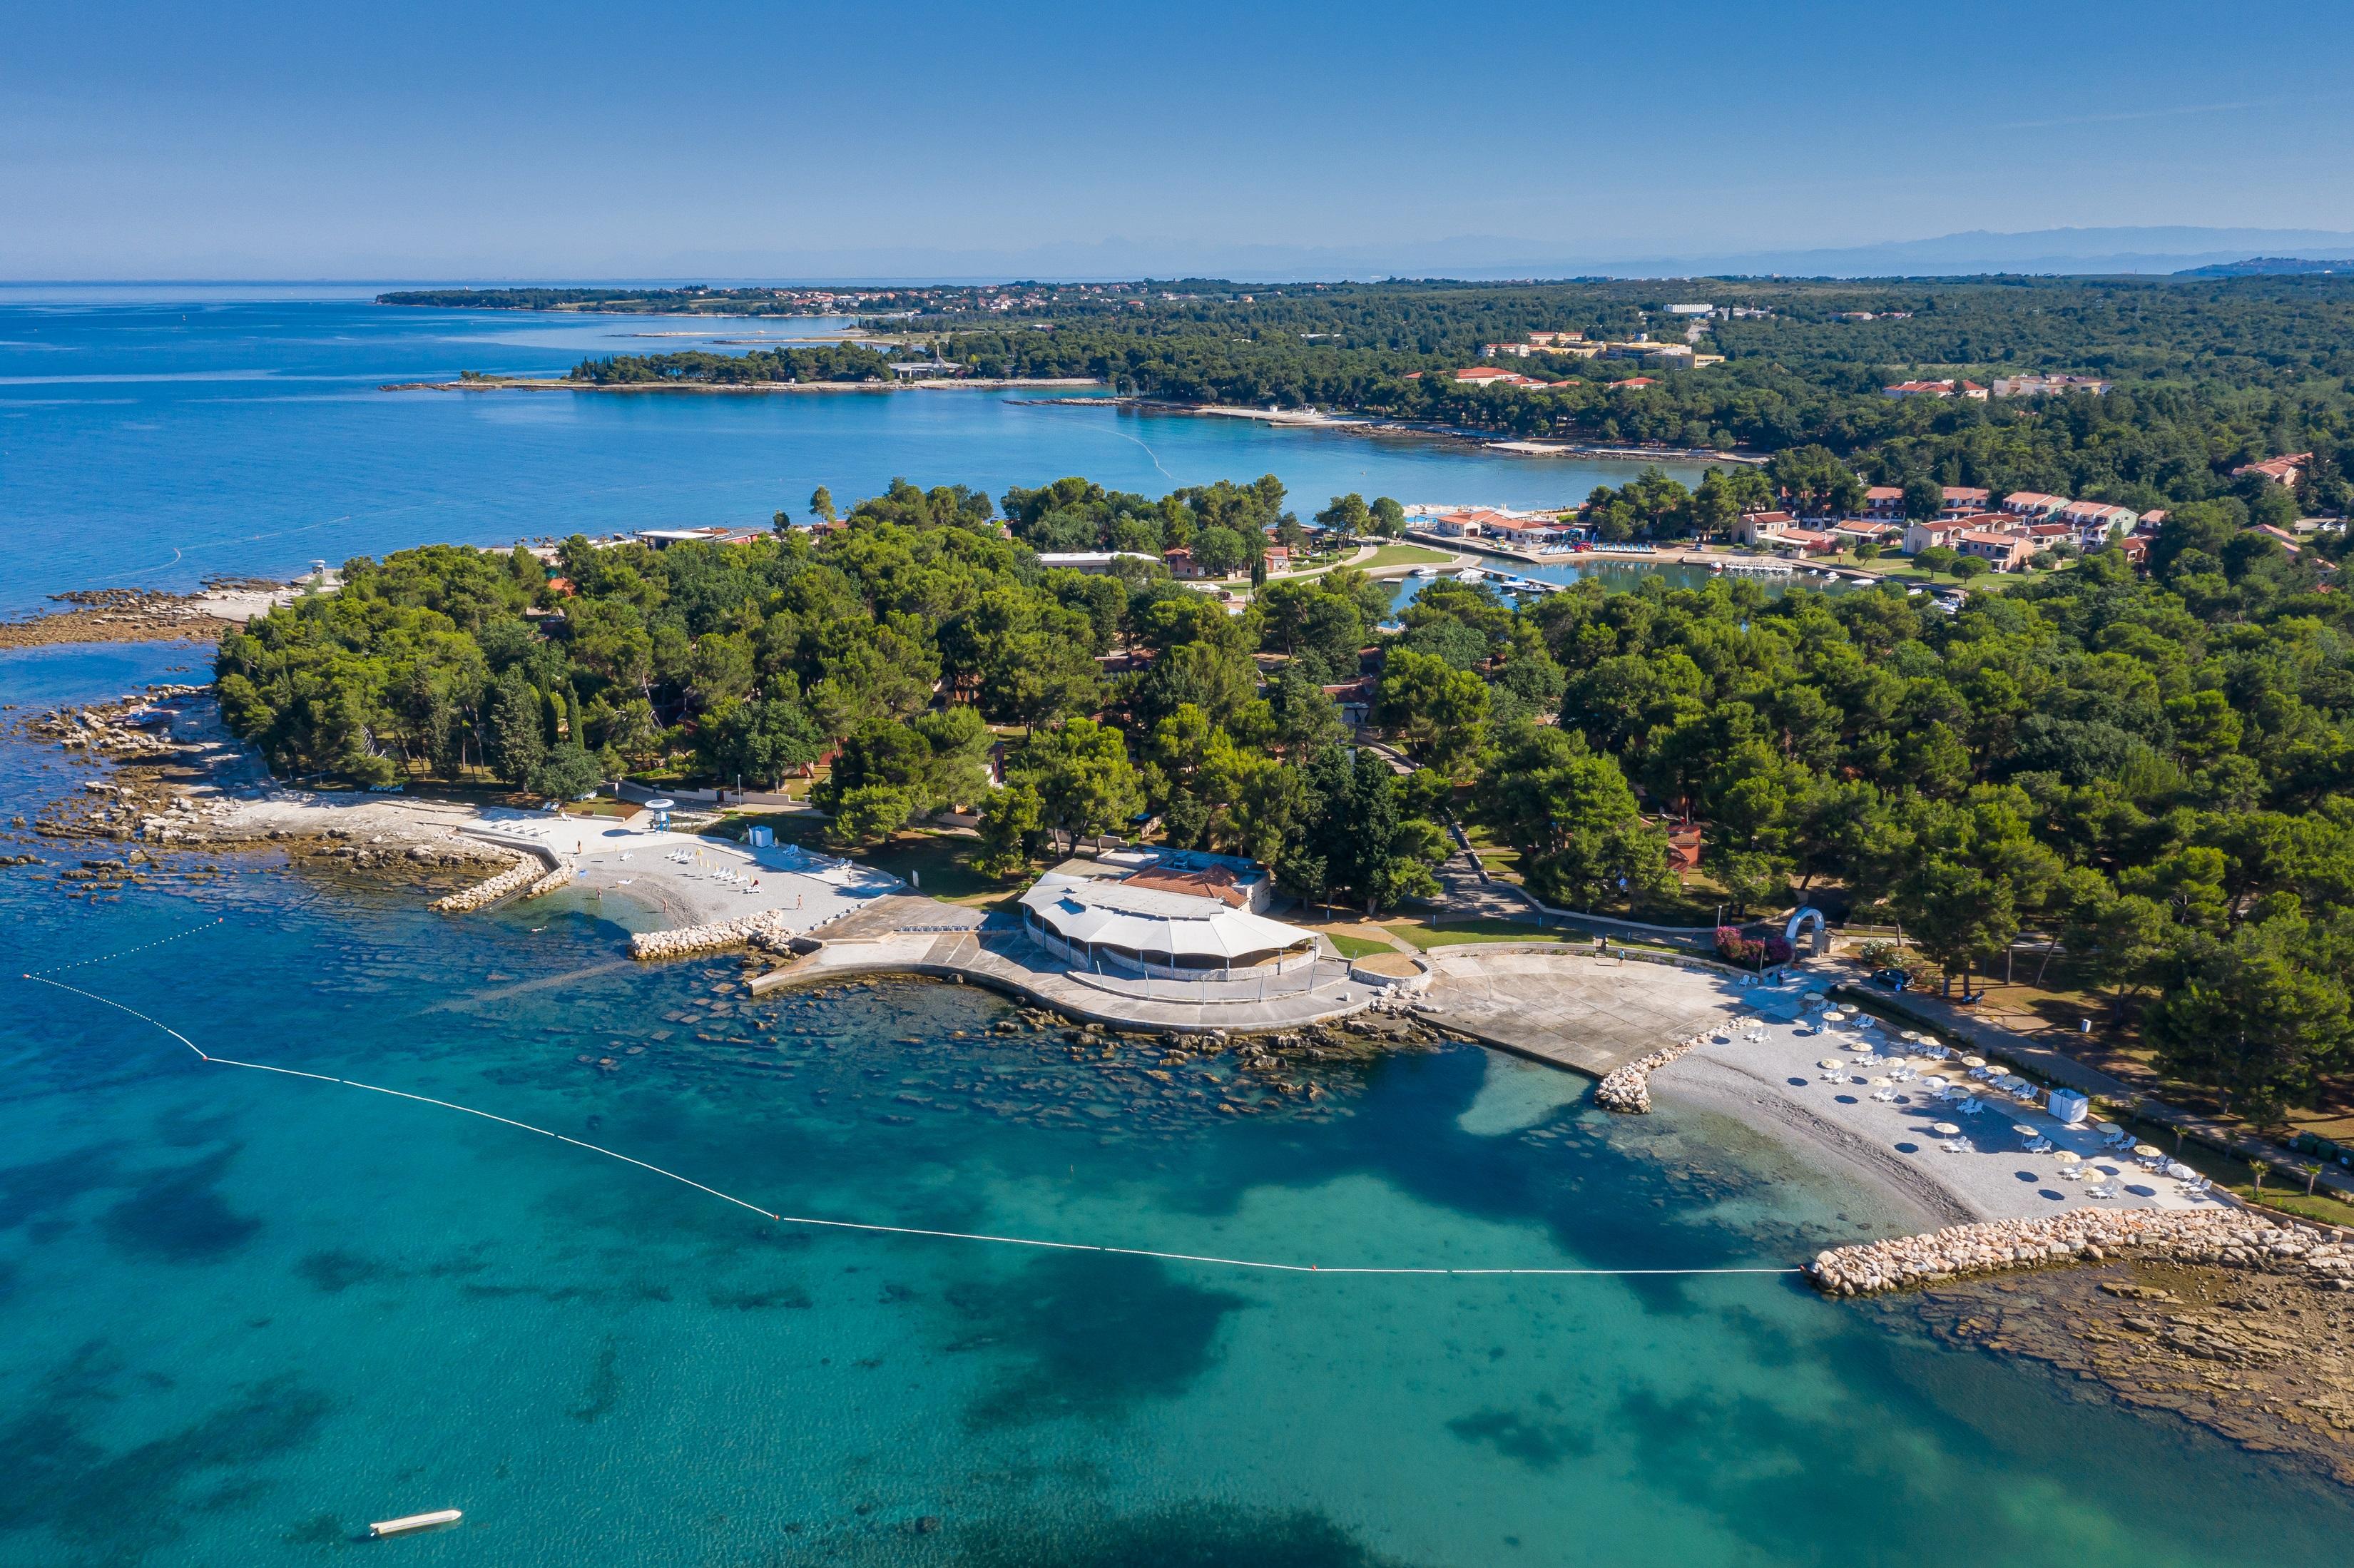 https://cms.satur.sk/data/imgs/tour_image/orig/stella_maris_resort_plava_laguna_2020_villas_beach_resized-1800582.jpg